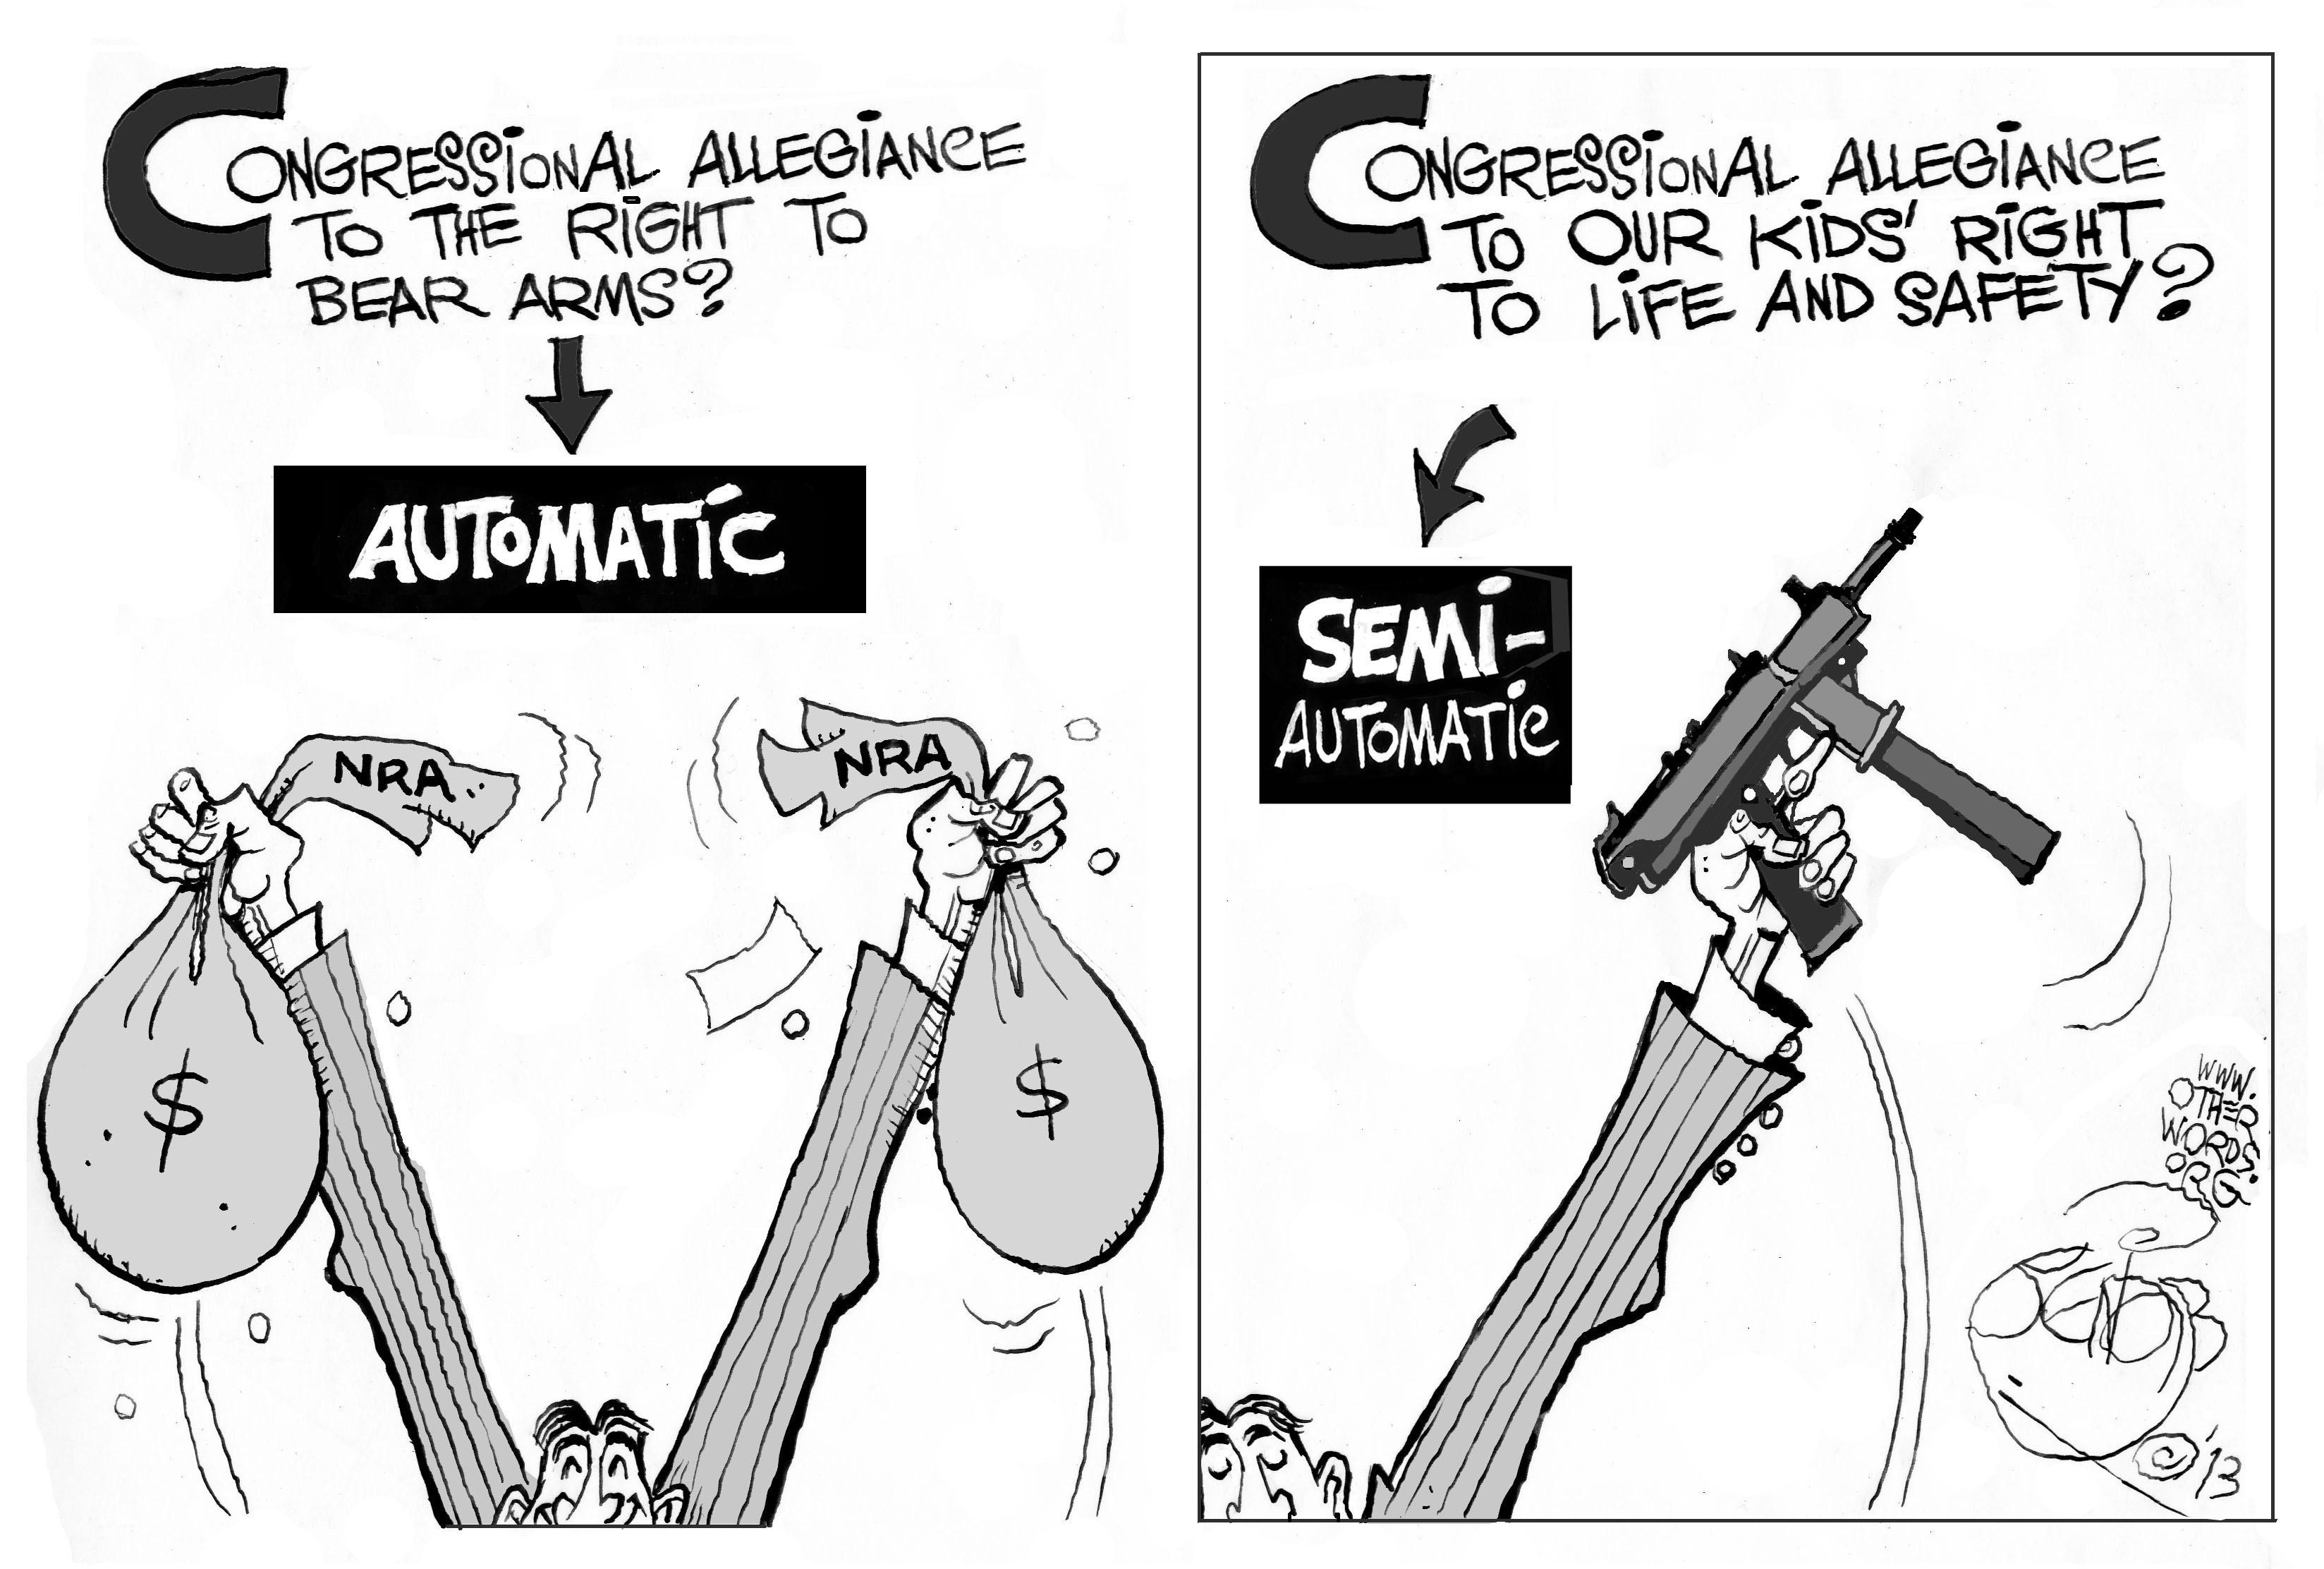 Automatic Congressional Allegiance